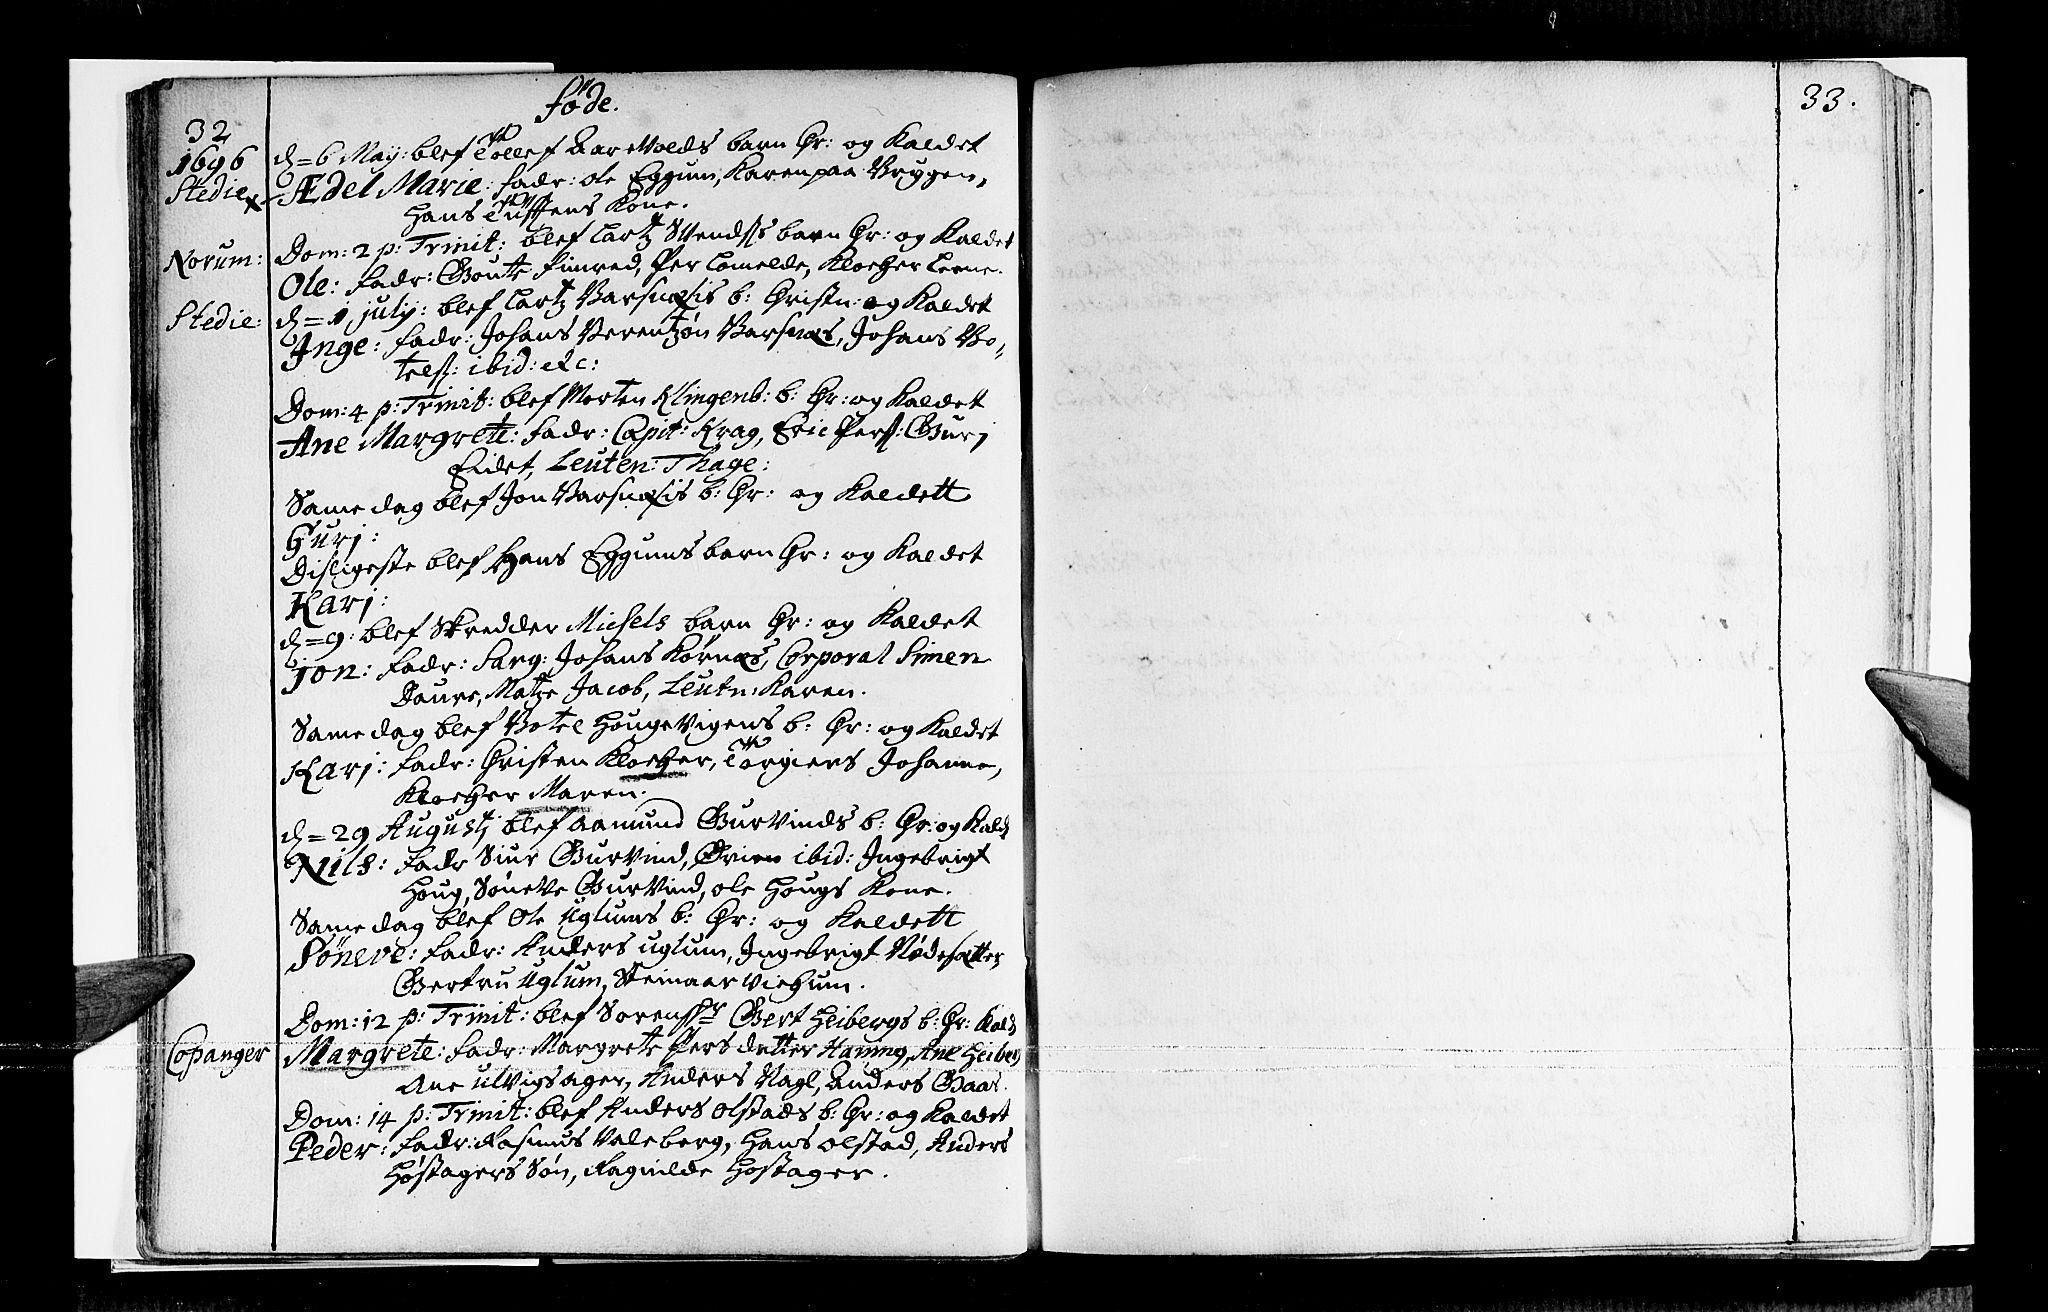 SAB, Sogndal sokneprestembete, H/Haa/Haaa/L0001: Ministerialbok nr. A 1, 1689-1713, s. 32-33